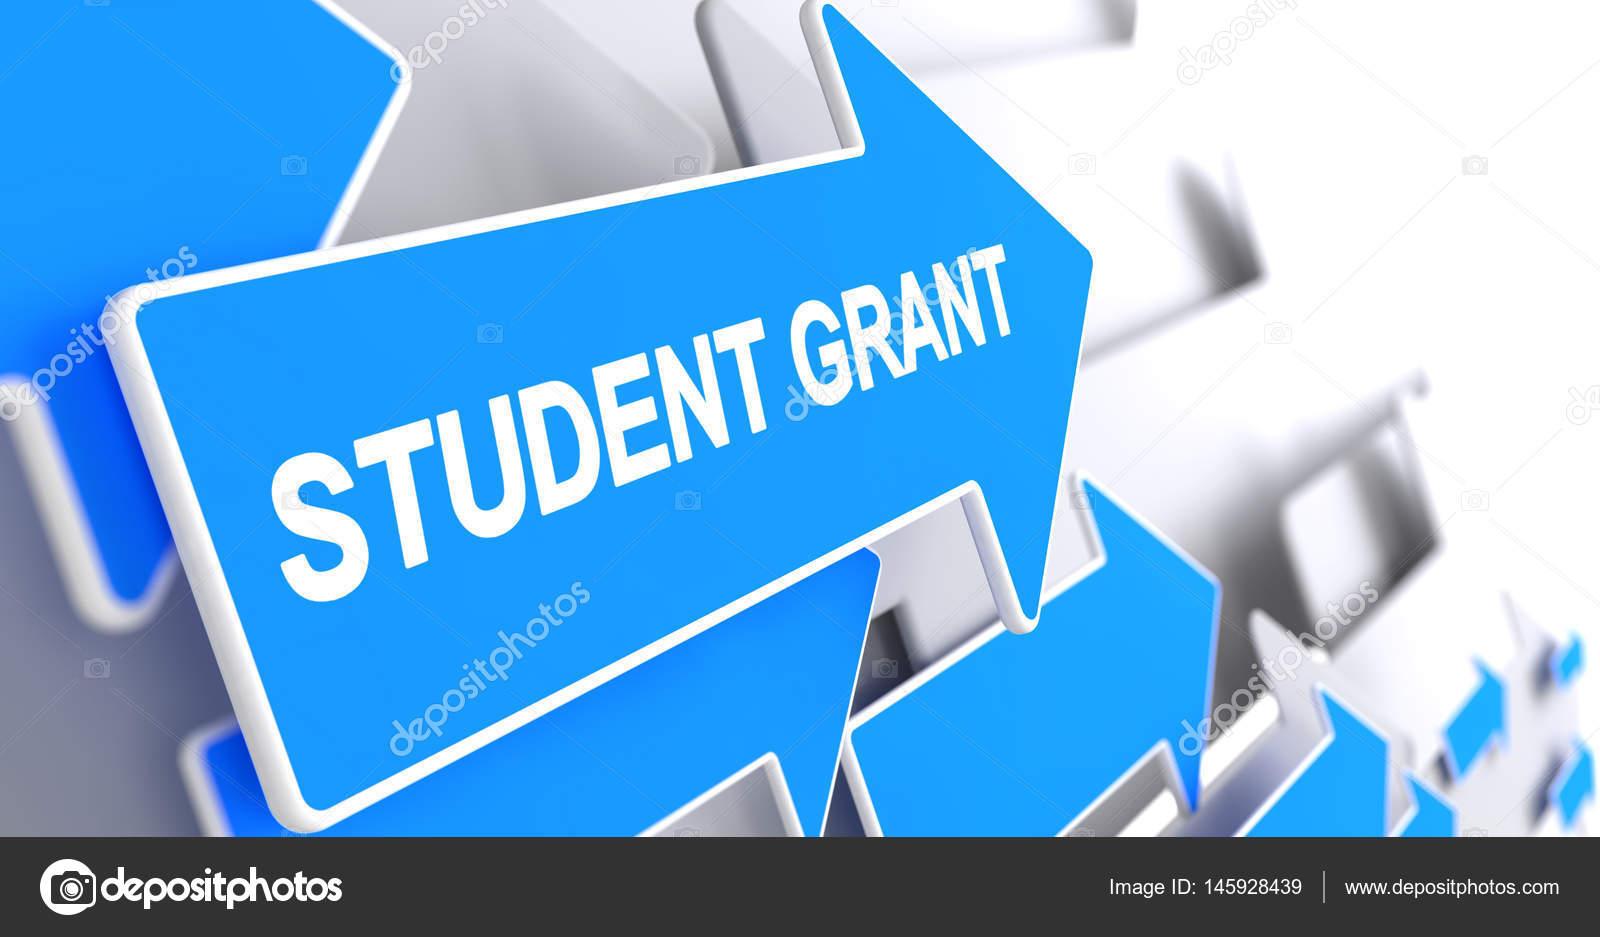 depositphotos 145928439 stock photo student grant label on blue